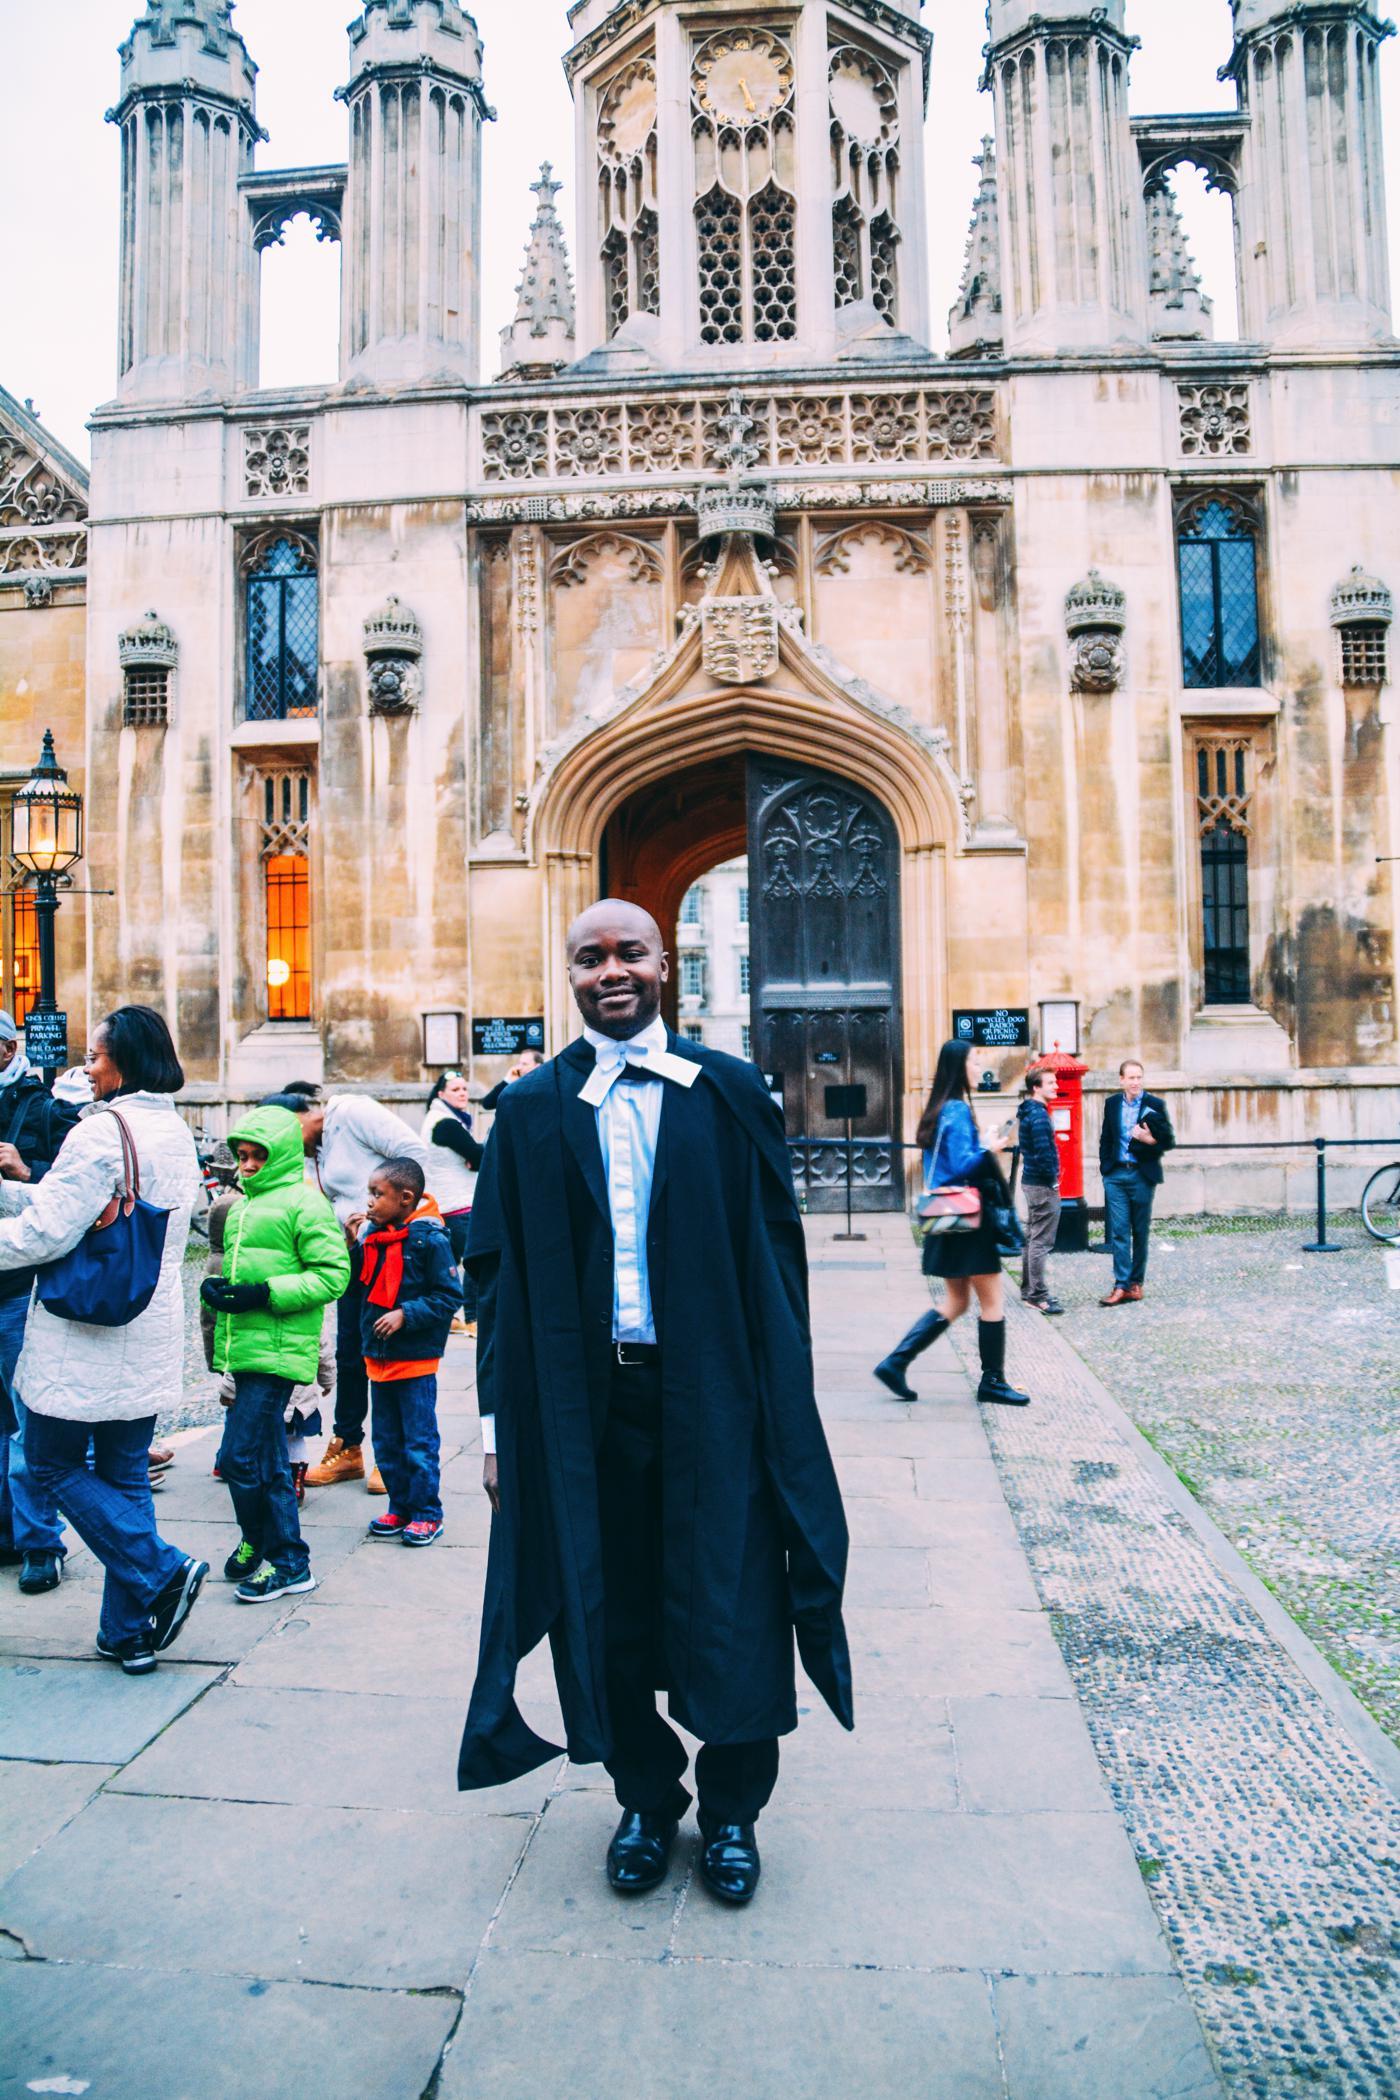 The University of Cambridge, Graduation, Senate House, Cambridge, England (9)